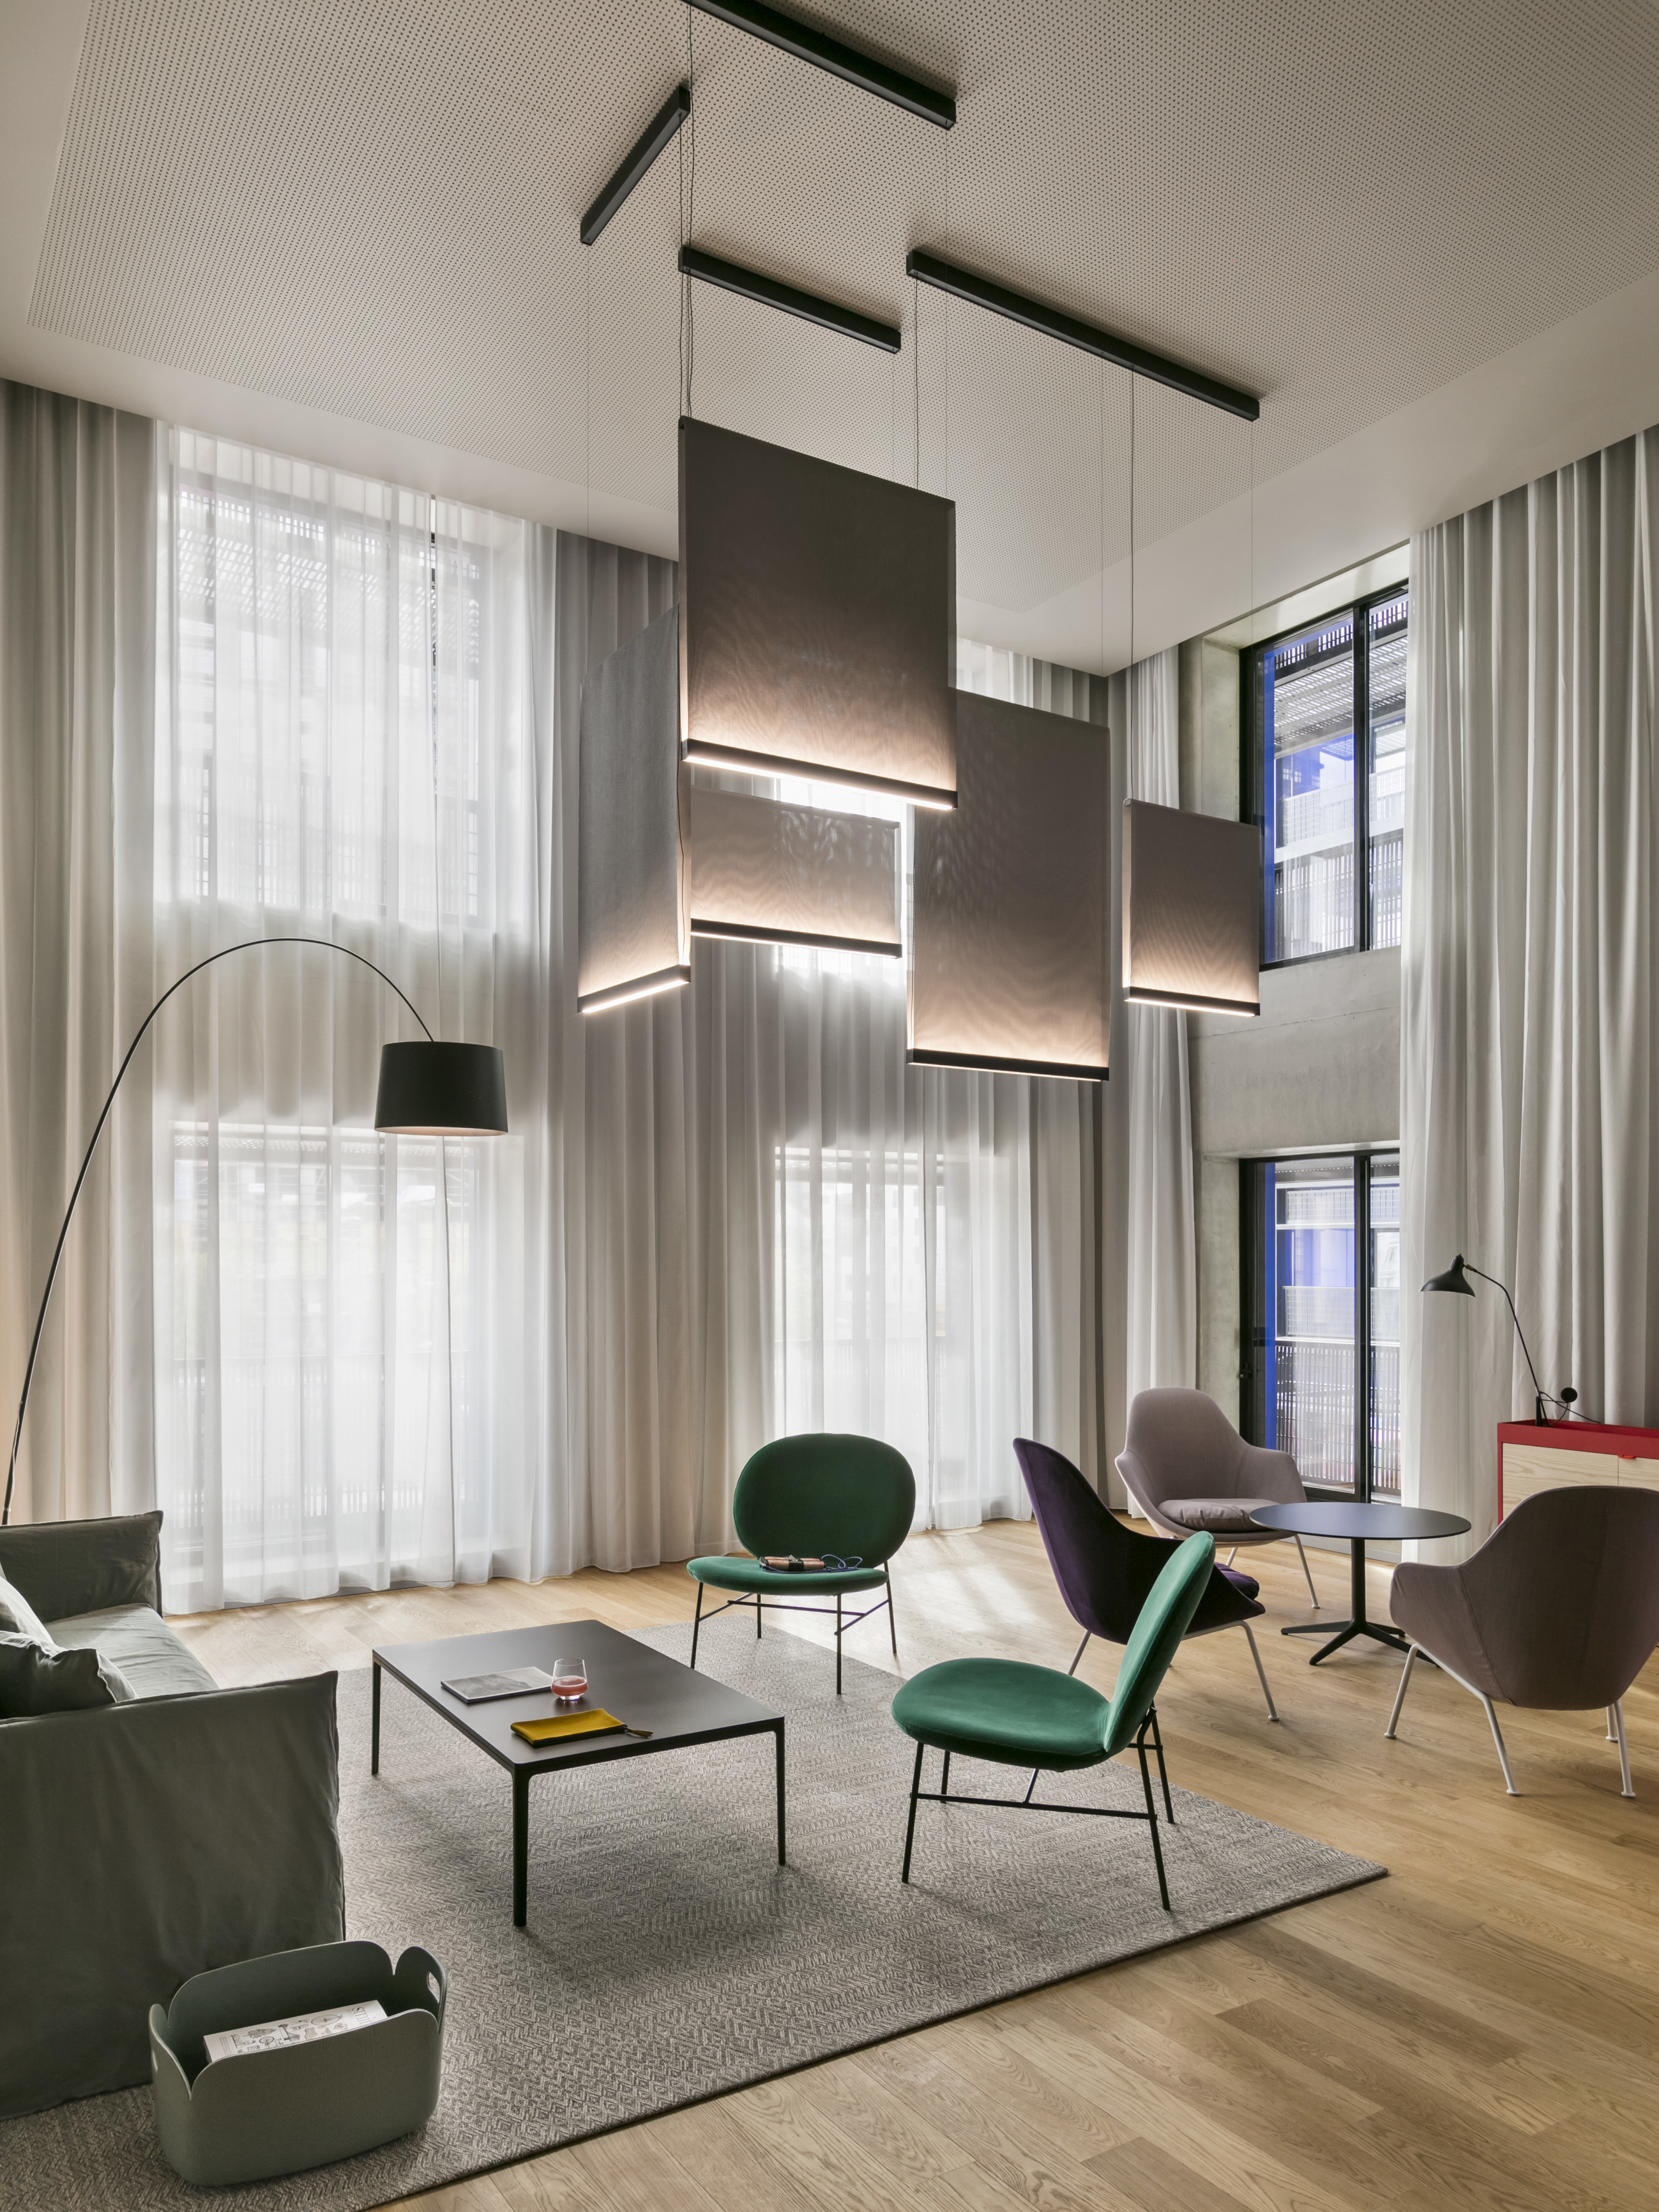 A hotel interior in strasbourg by patrick norguet stylepark for Hotel design strasbourg